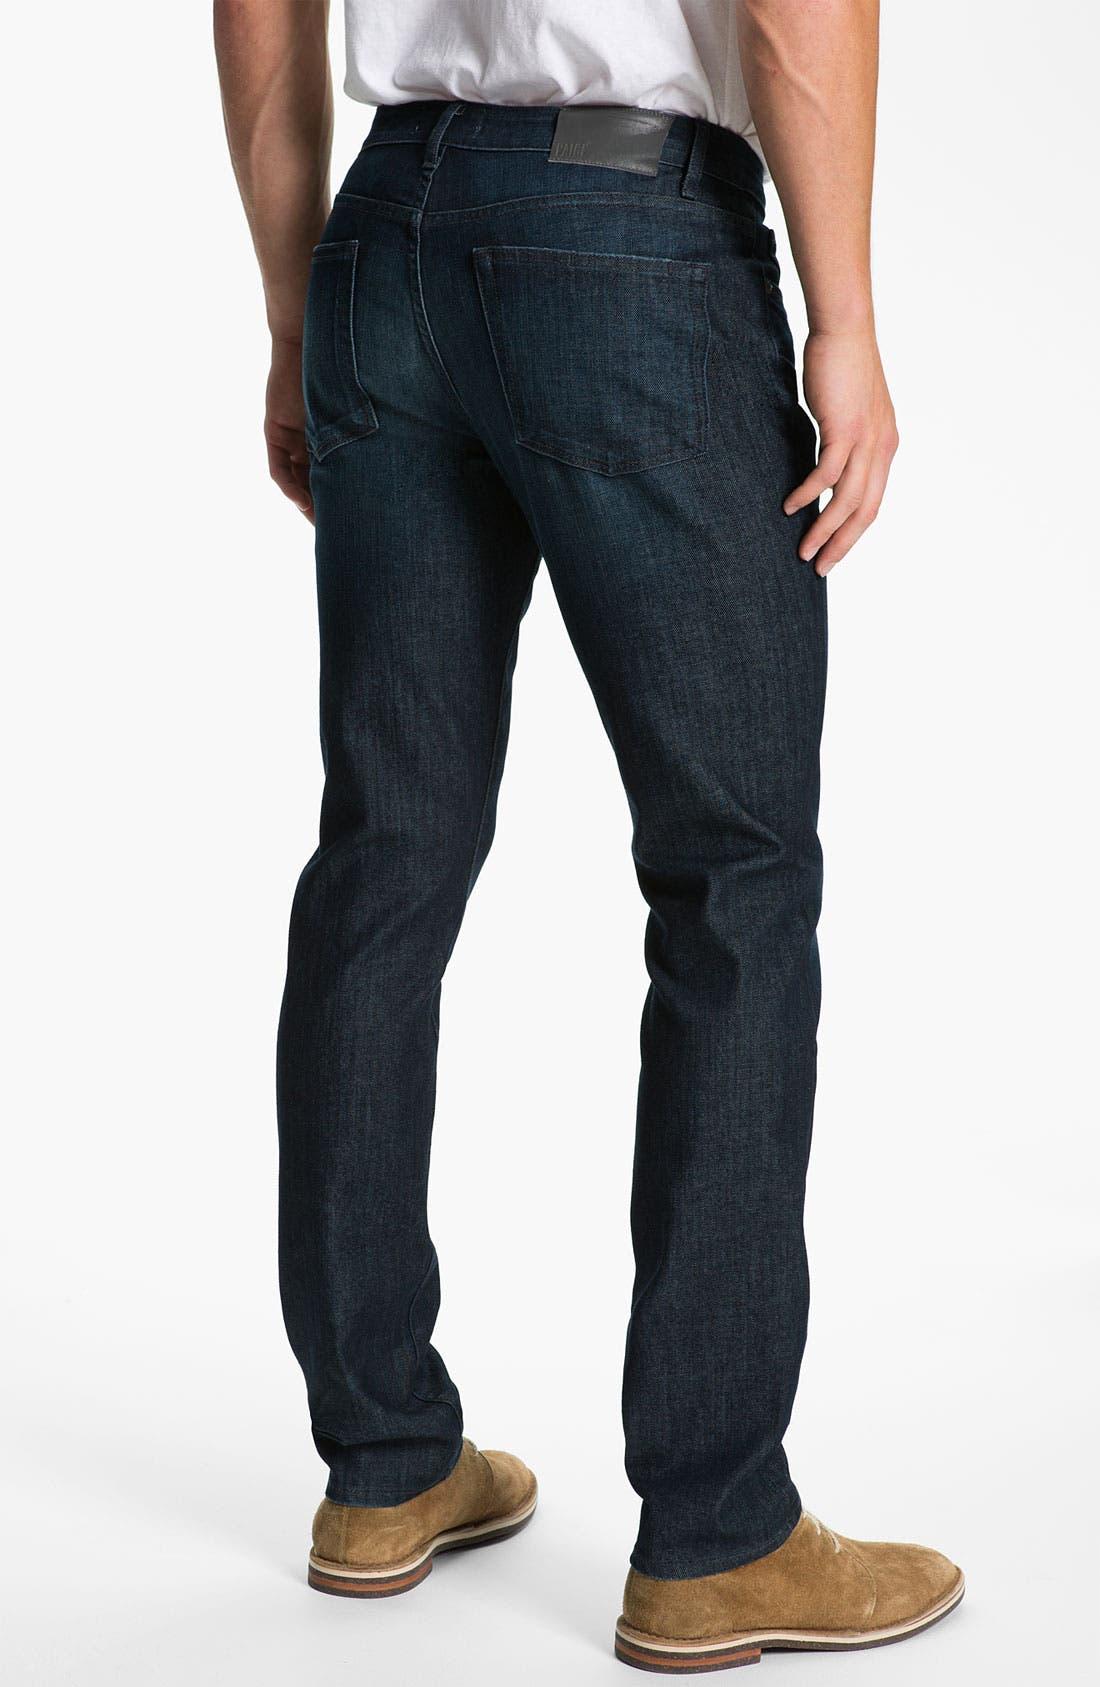 Alternate Image 1 Selected - PAIGE 'Normandie' Slim Straight Leg Jeans (Warrior)